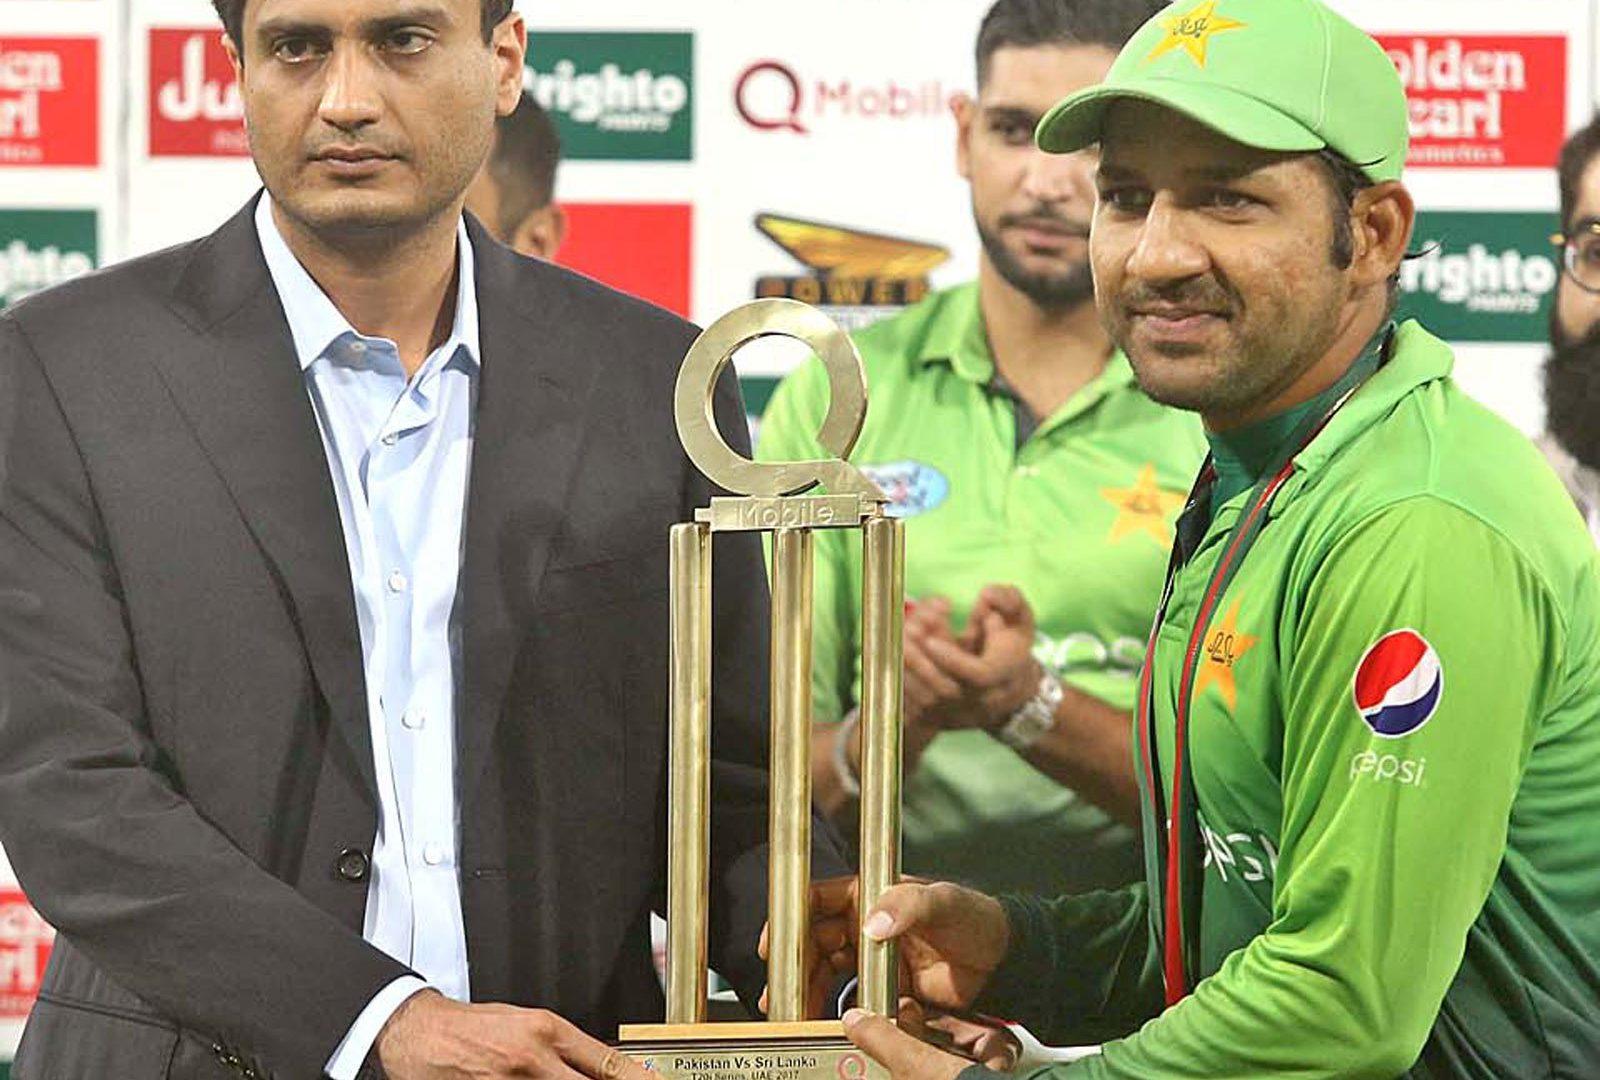 Pakistan cricket team captain Sarfraz Ahmad receiving winning trophy after winning third and last T20 International cricket match between Pakistan and Sri Lanka at the Gaddafi Stadium. Photo: APP